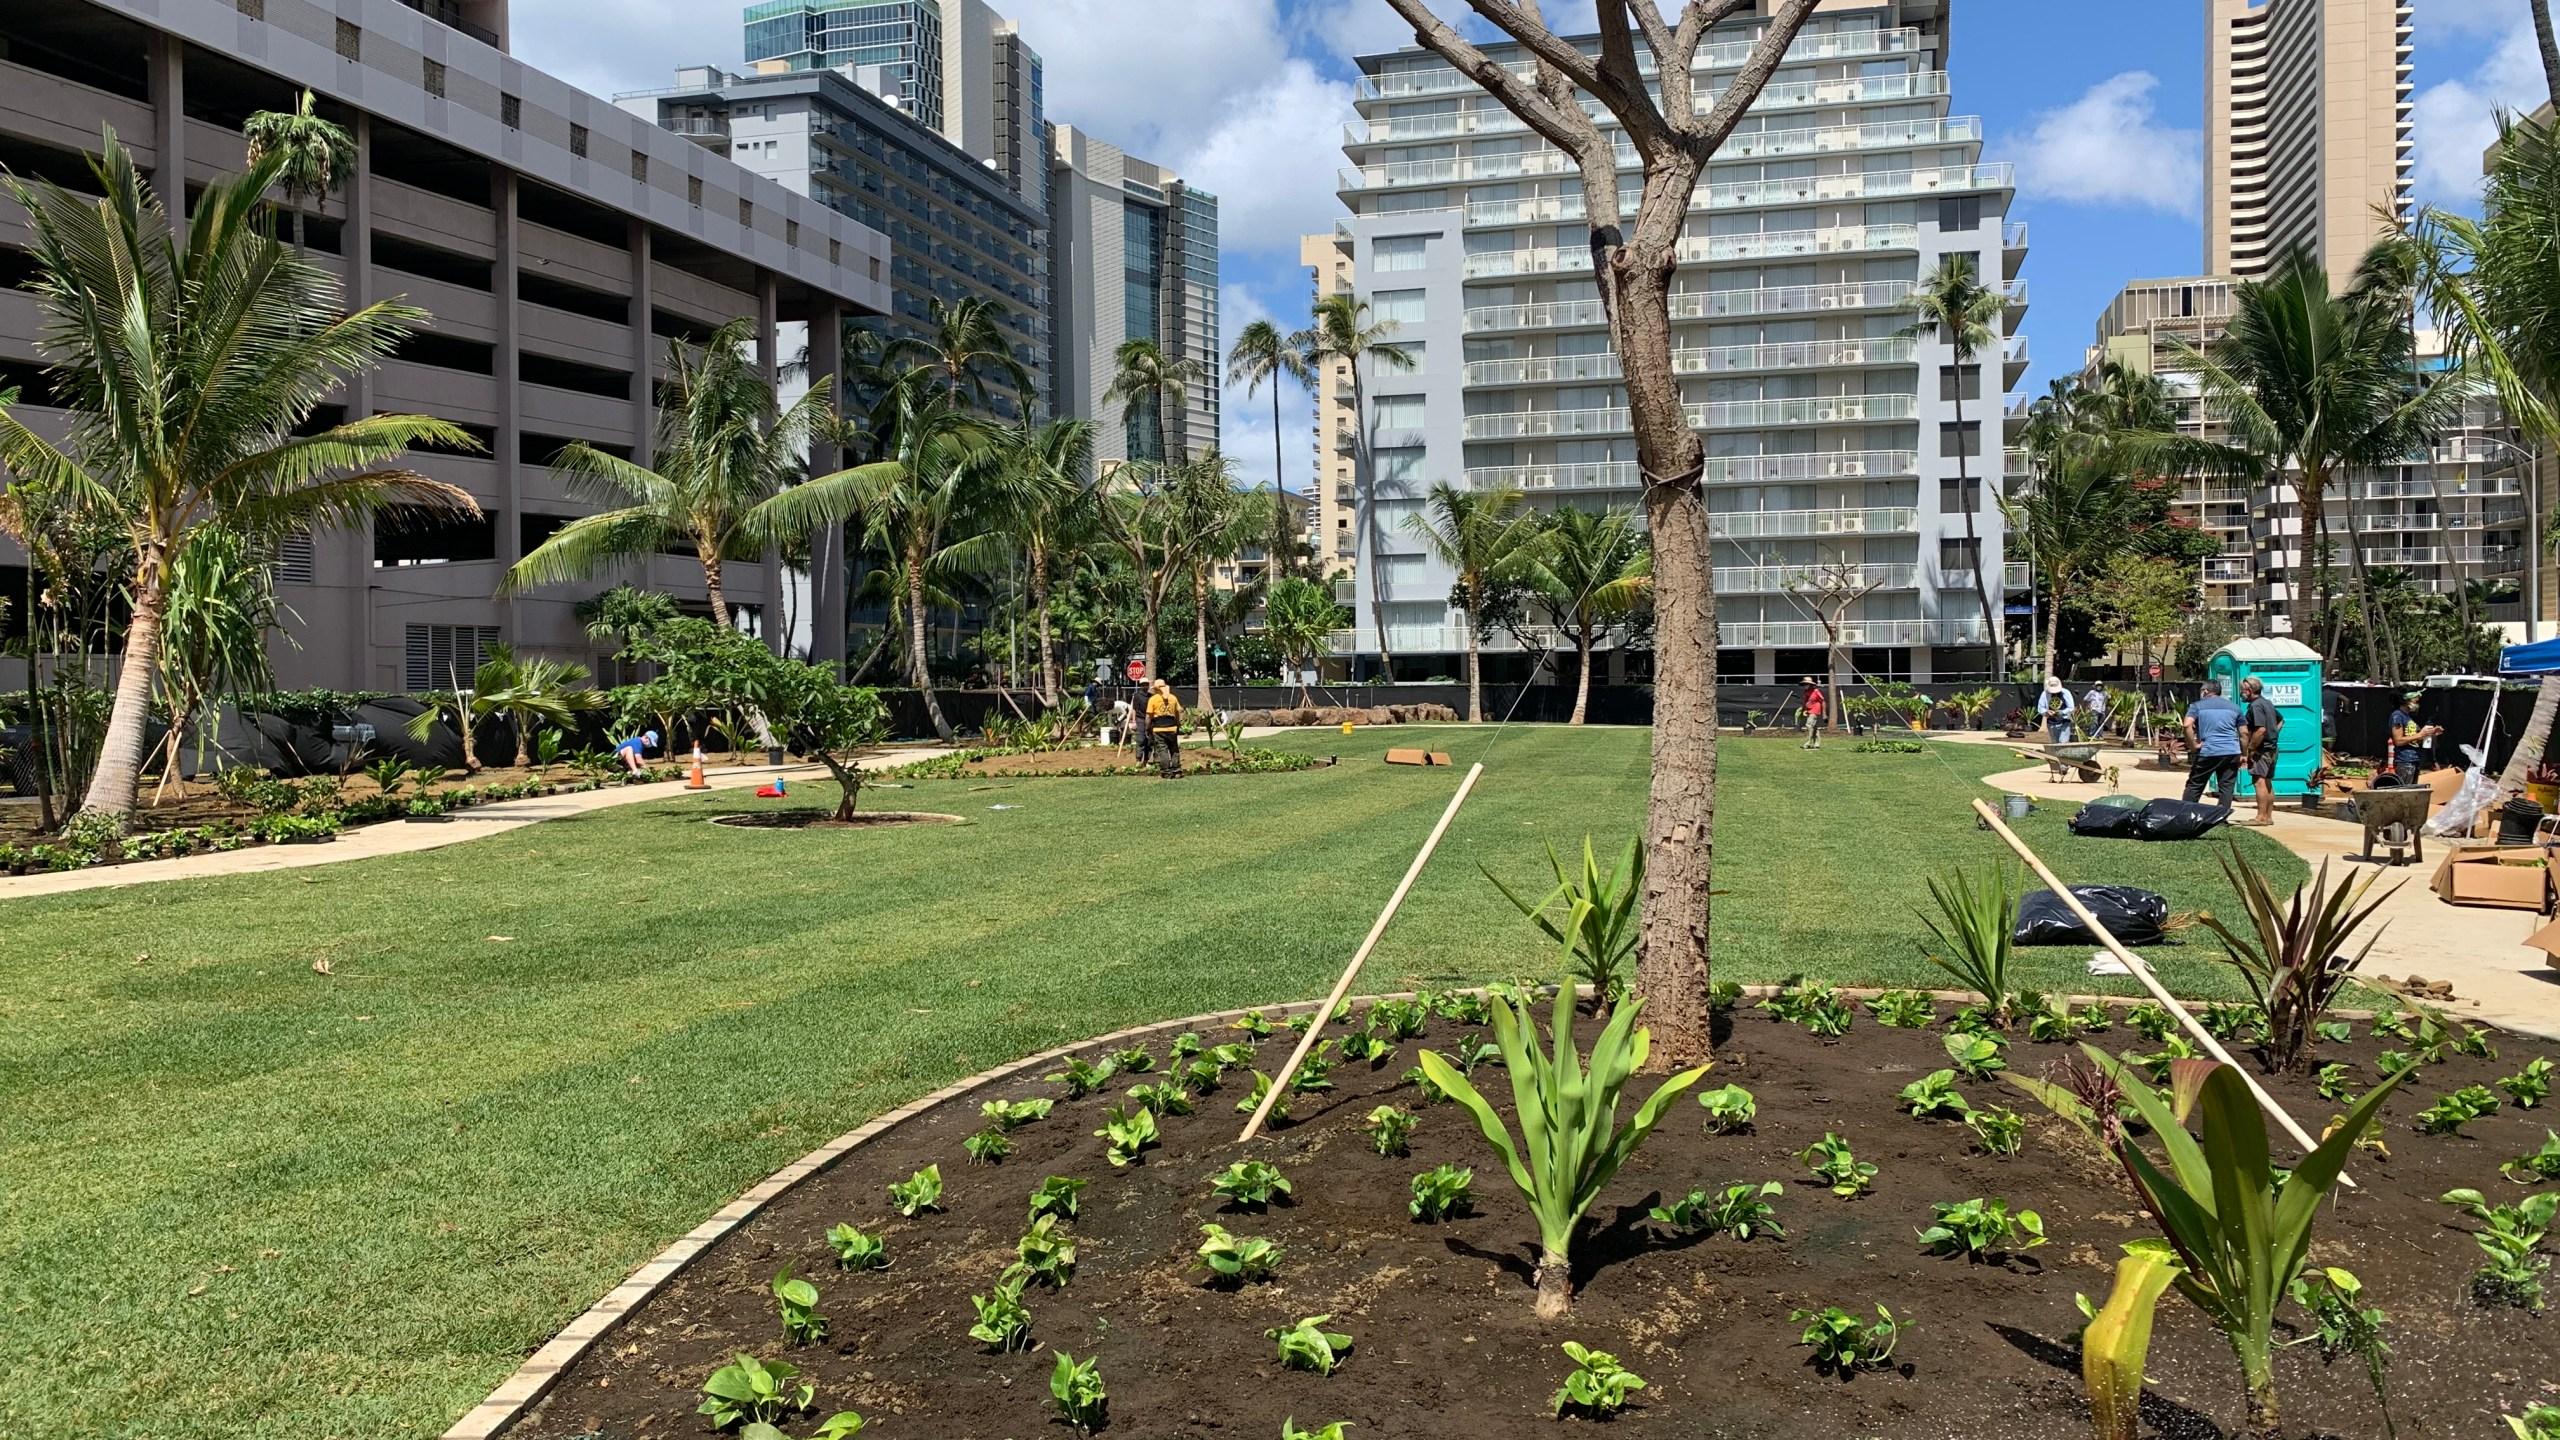 Courtesy: City and County of Honolulu / Rotary Club of Honolulu